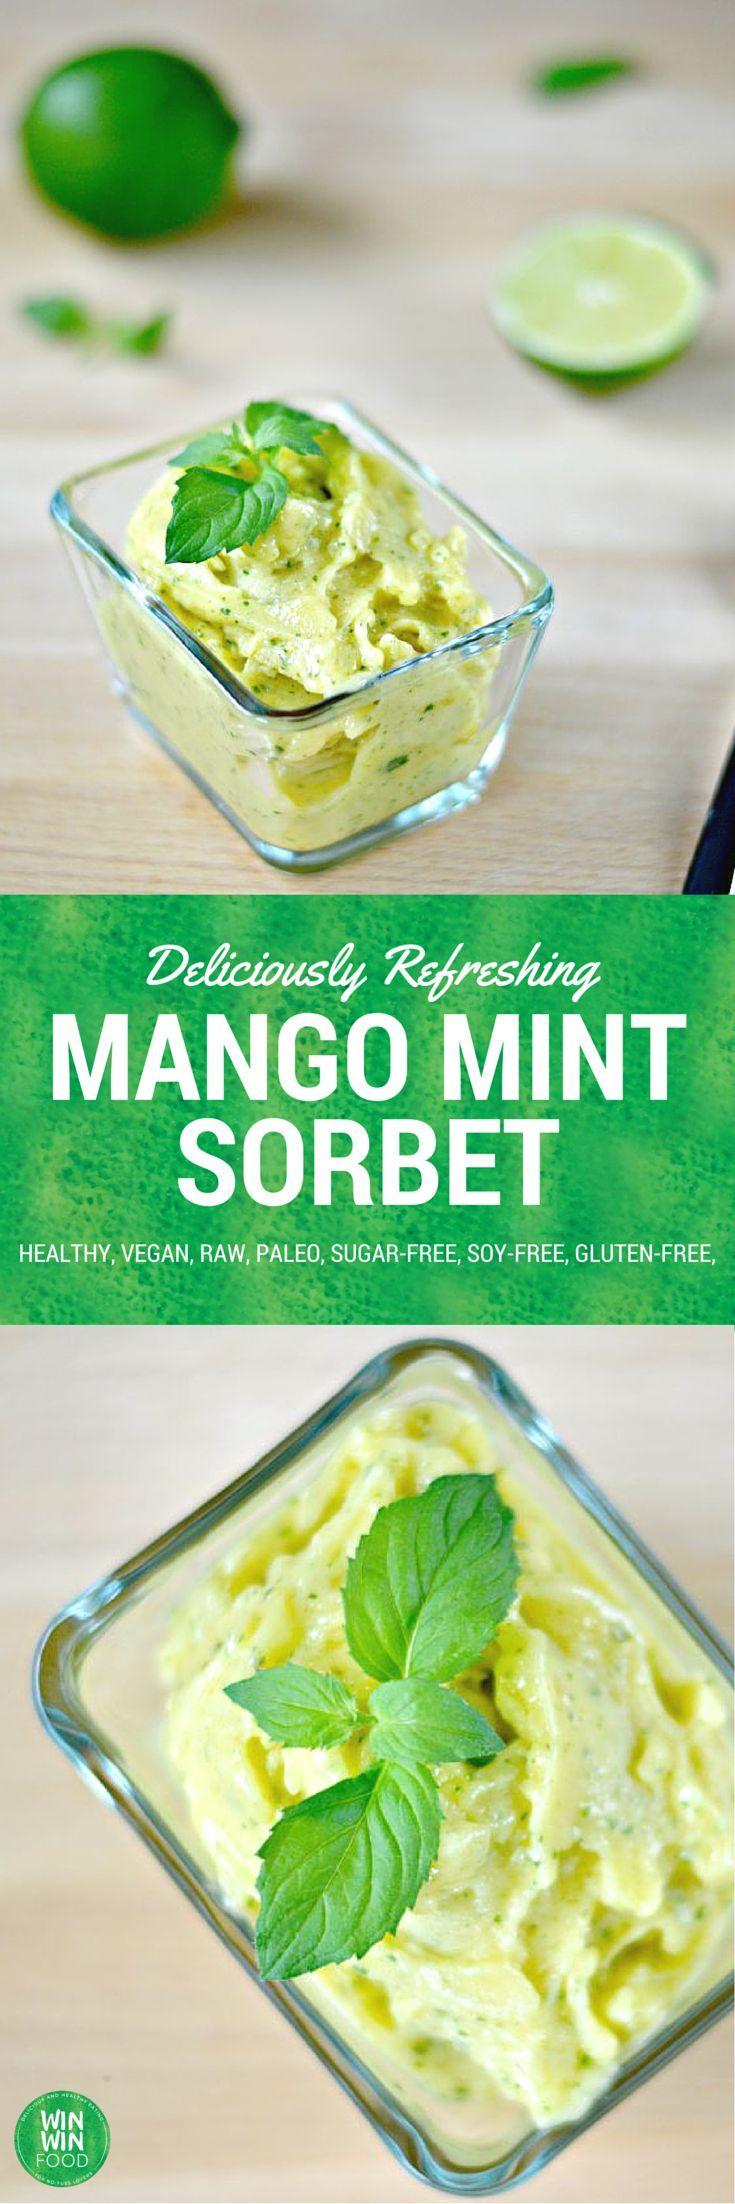 Lime Infused Mango Sorbet | WIN-WINFOOD #healthy #cleaneating #healtyeating…